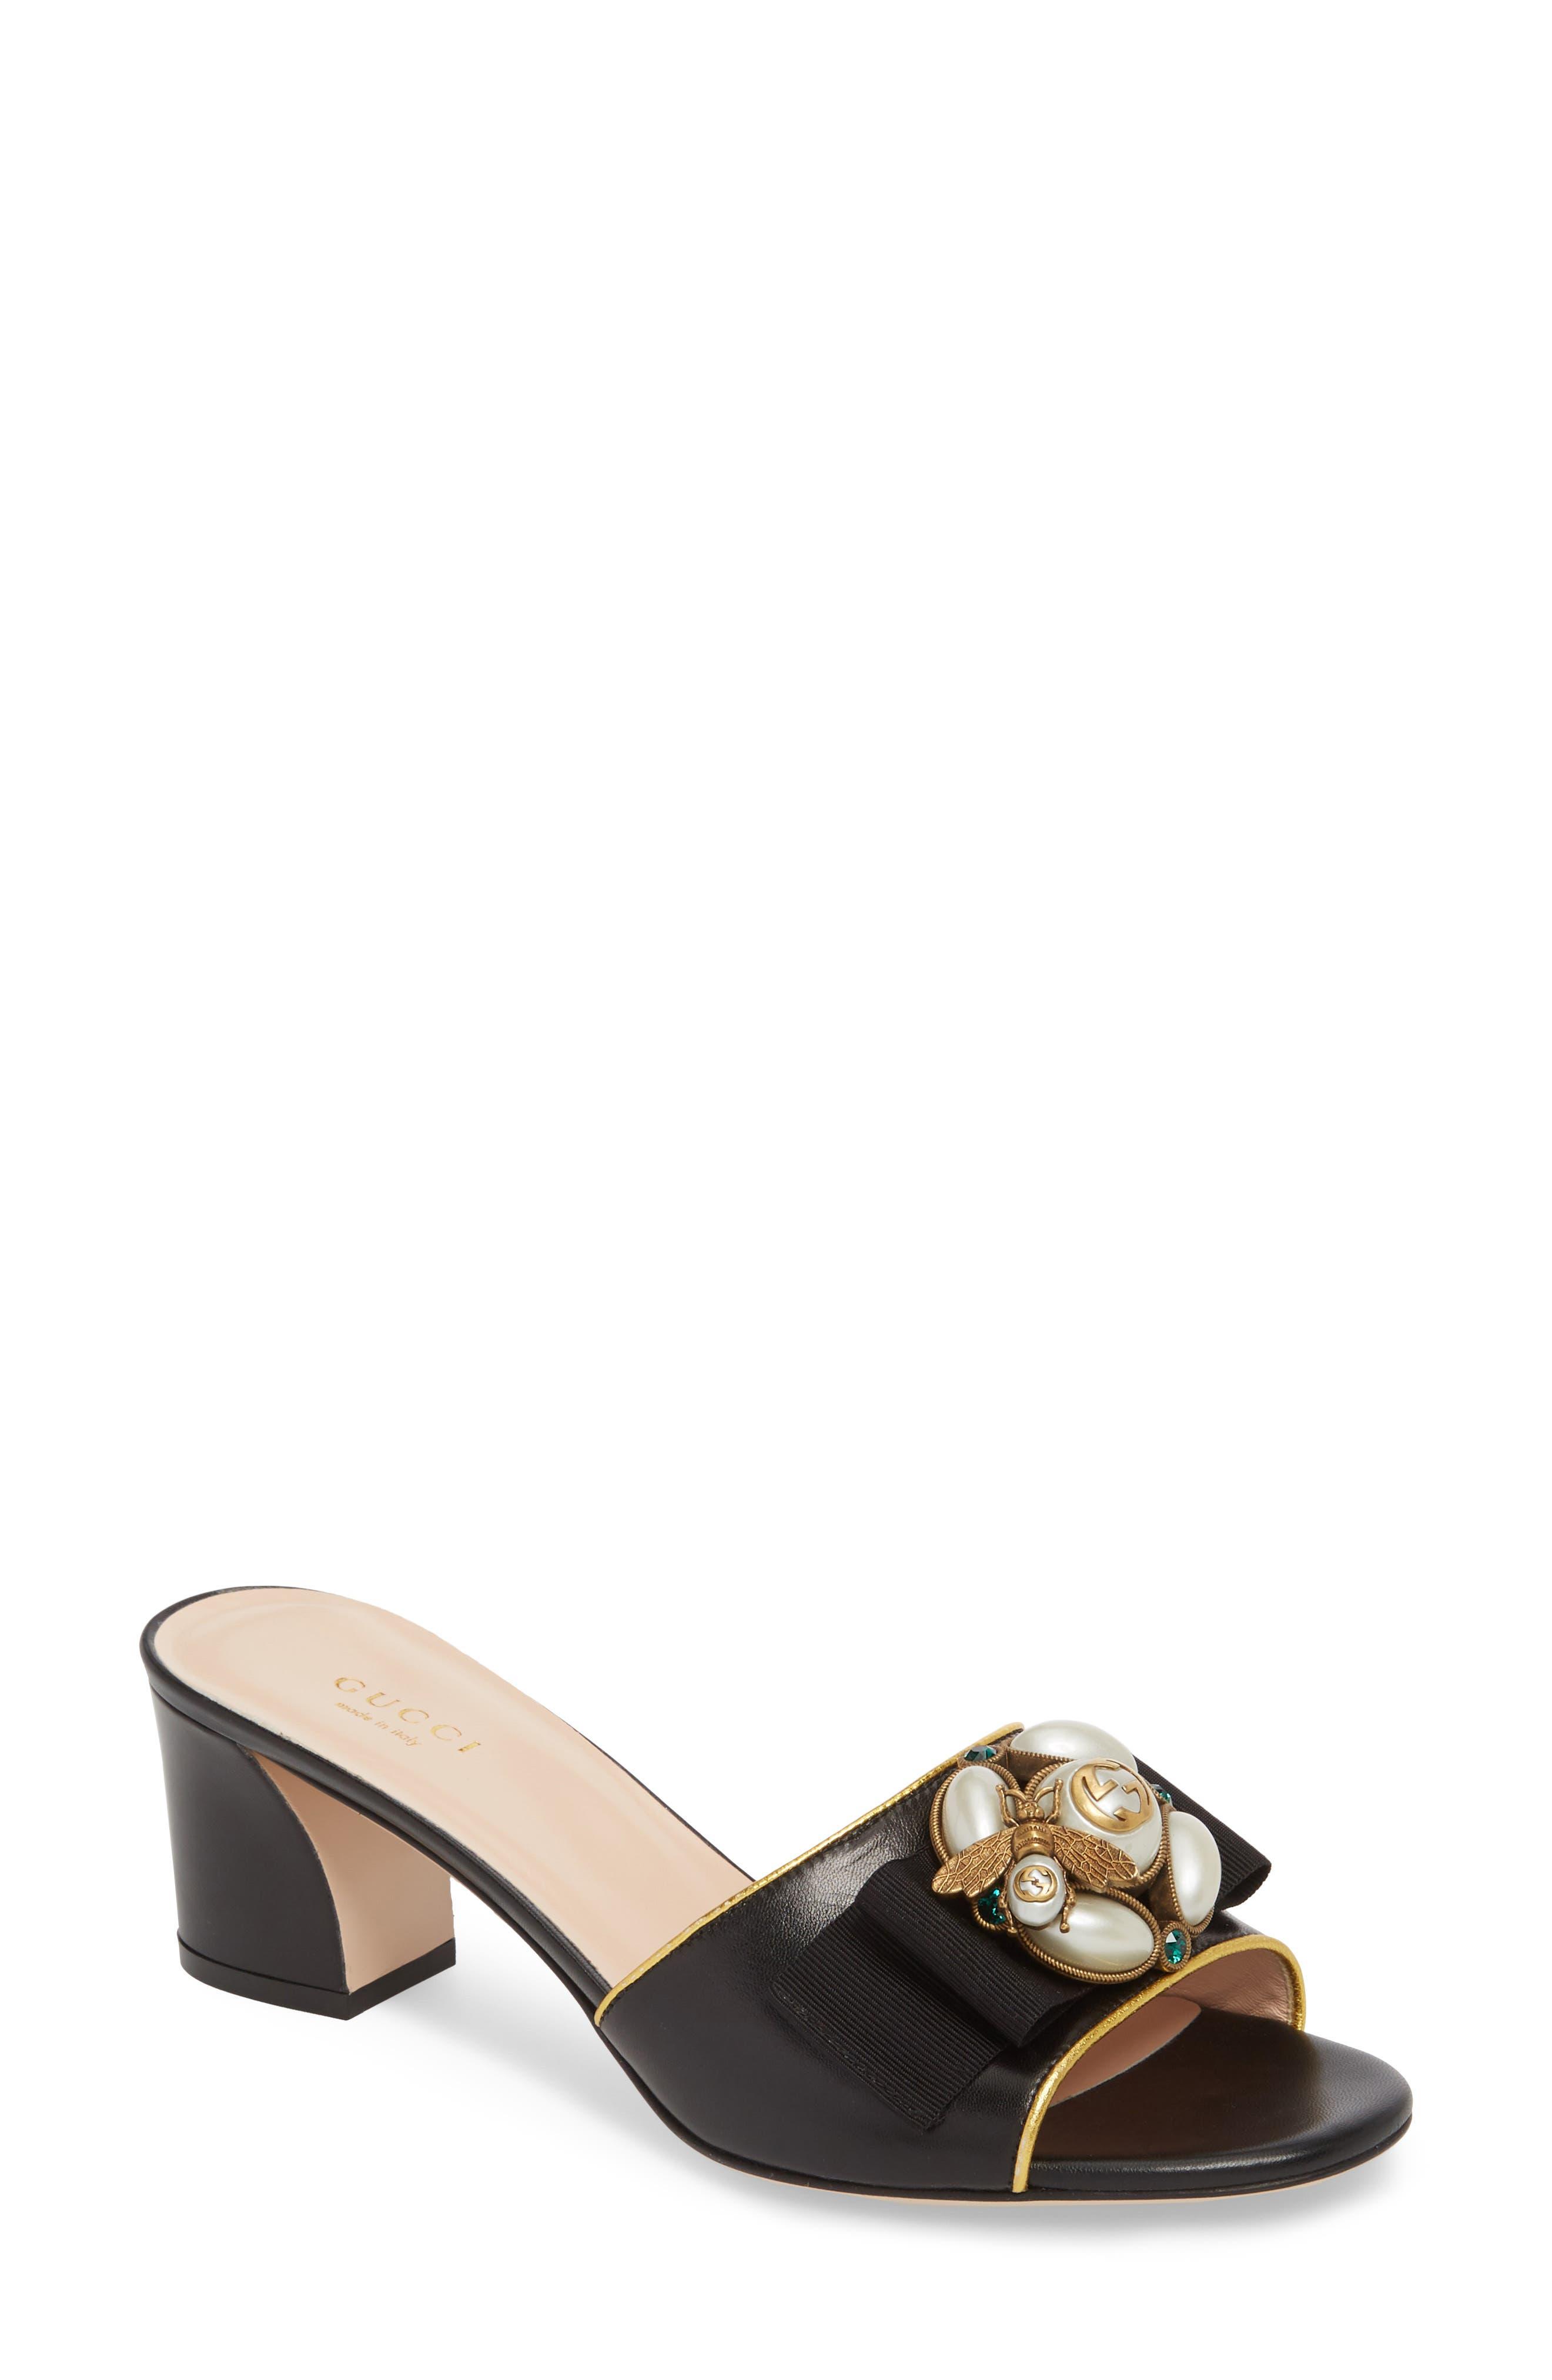 Gucci Etoile Bee Embellished Slide Sandal (Women)